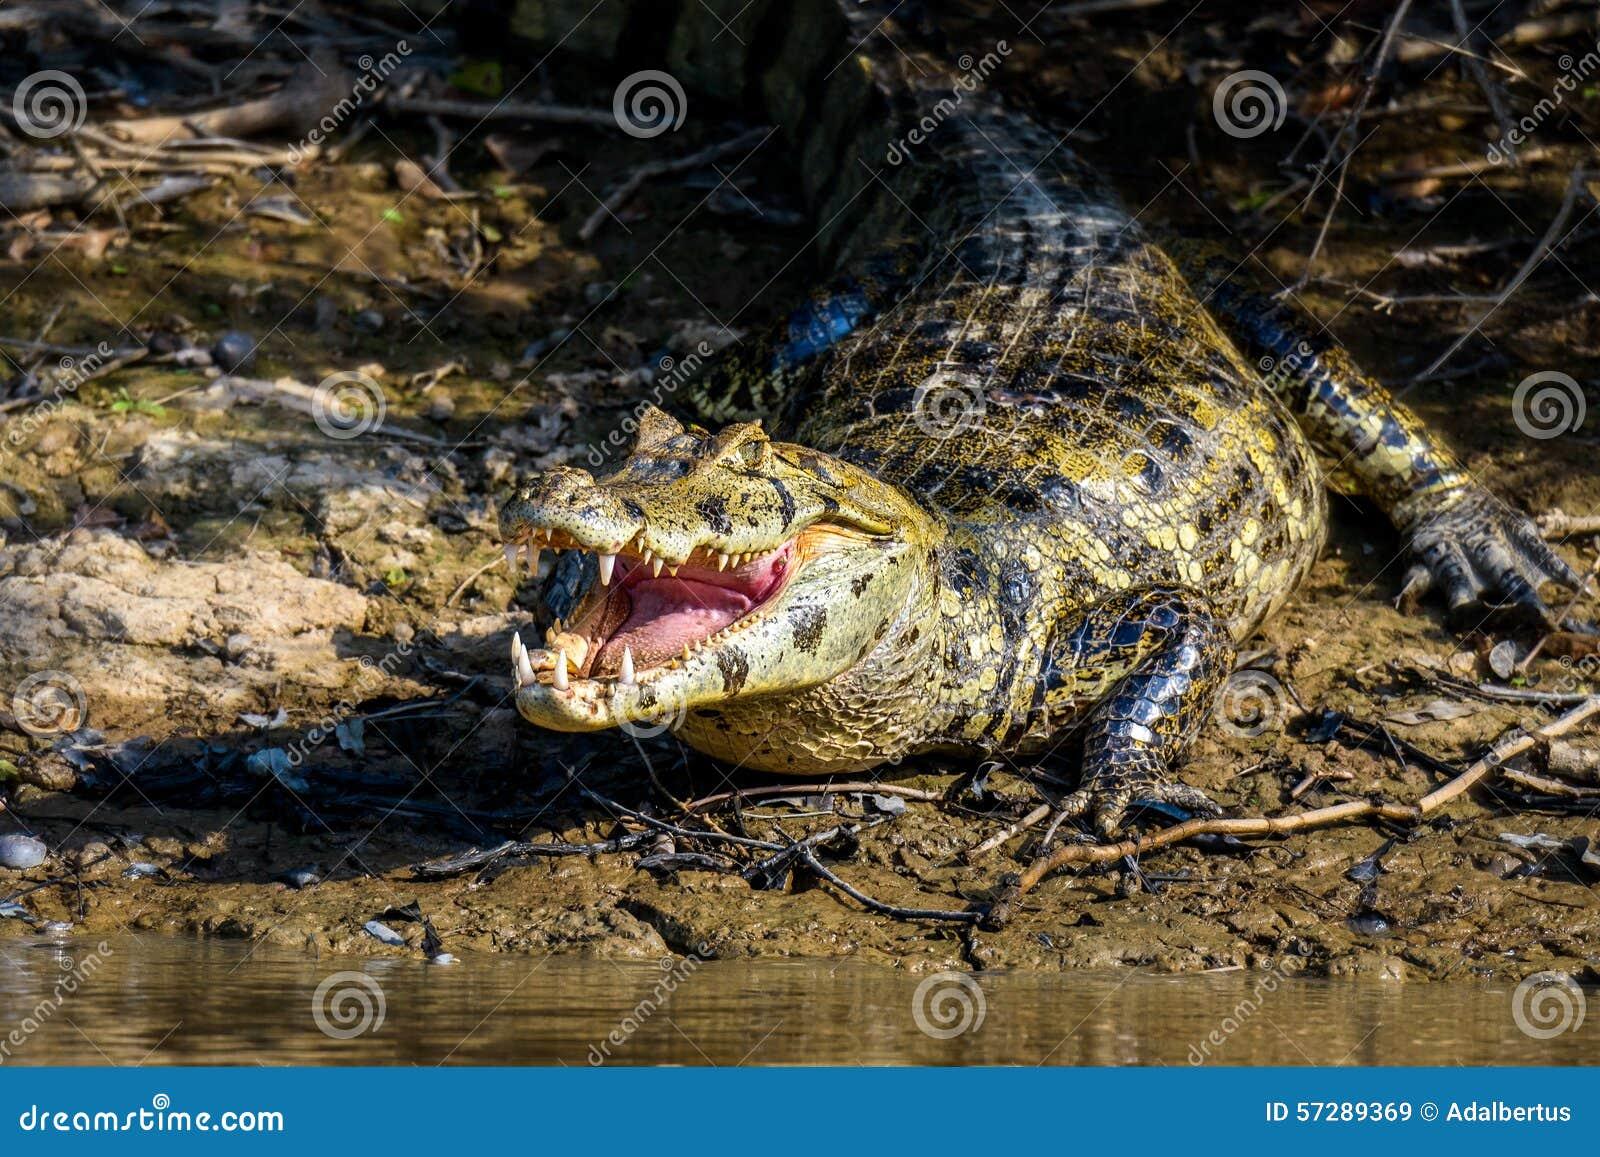 Black caiman - Wikipedia